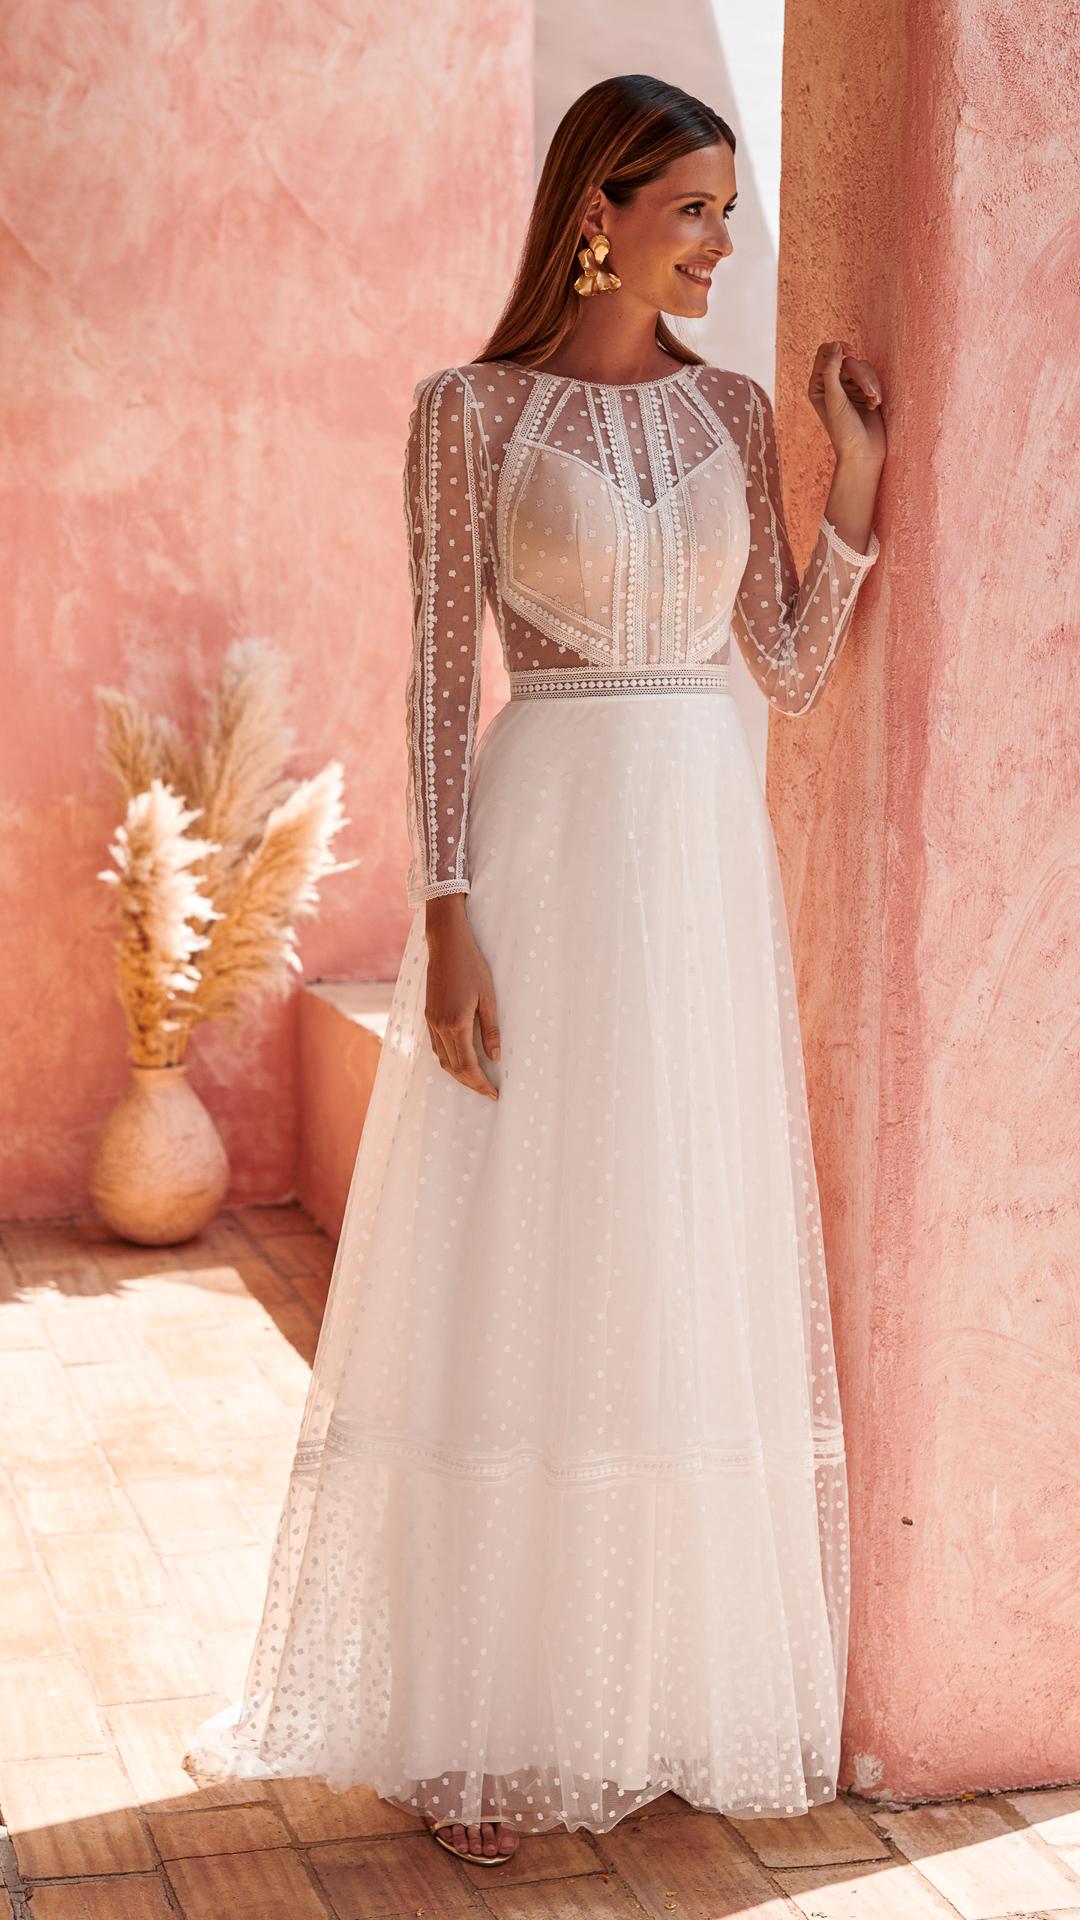 Faridah - Marylise Brautkleider 2020